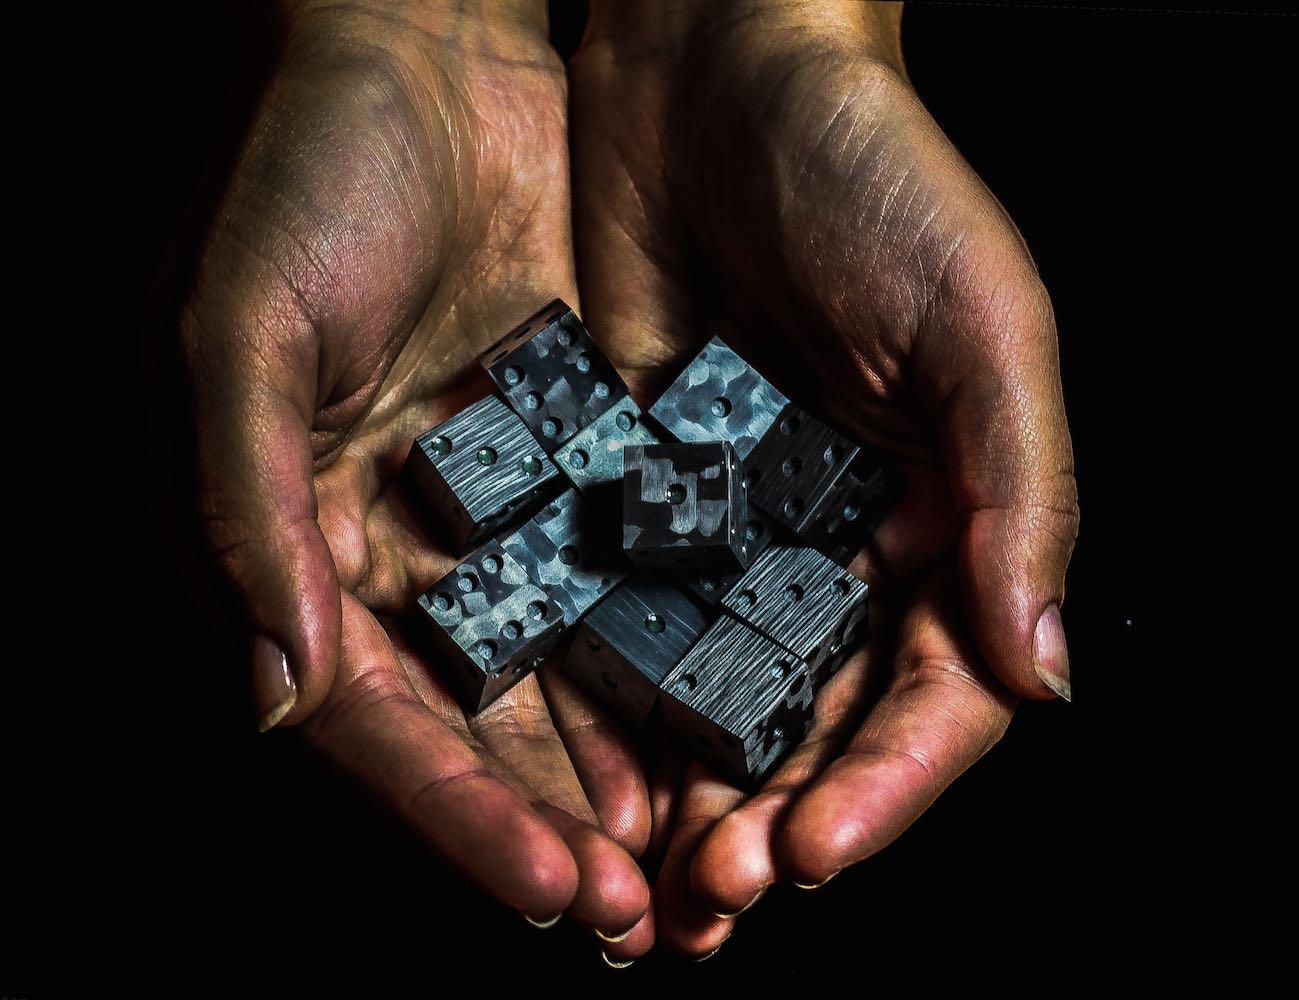 cotocube-solid-carbon-fiber-dice-02